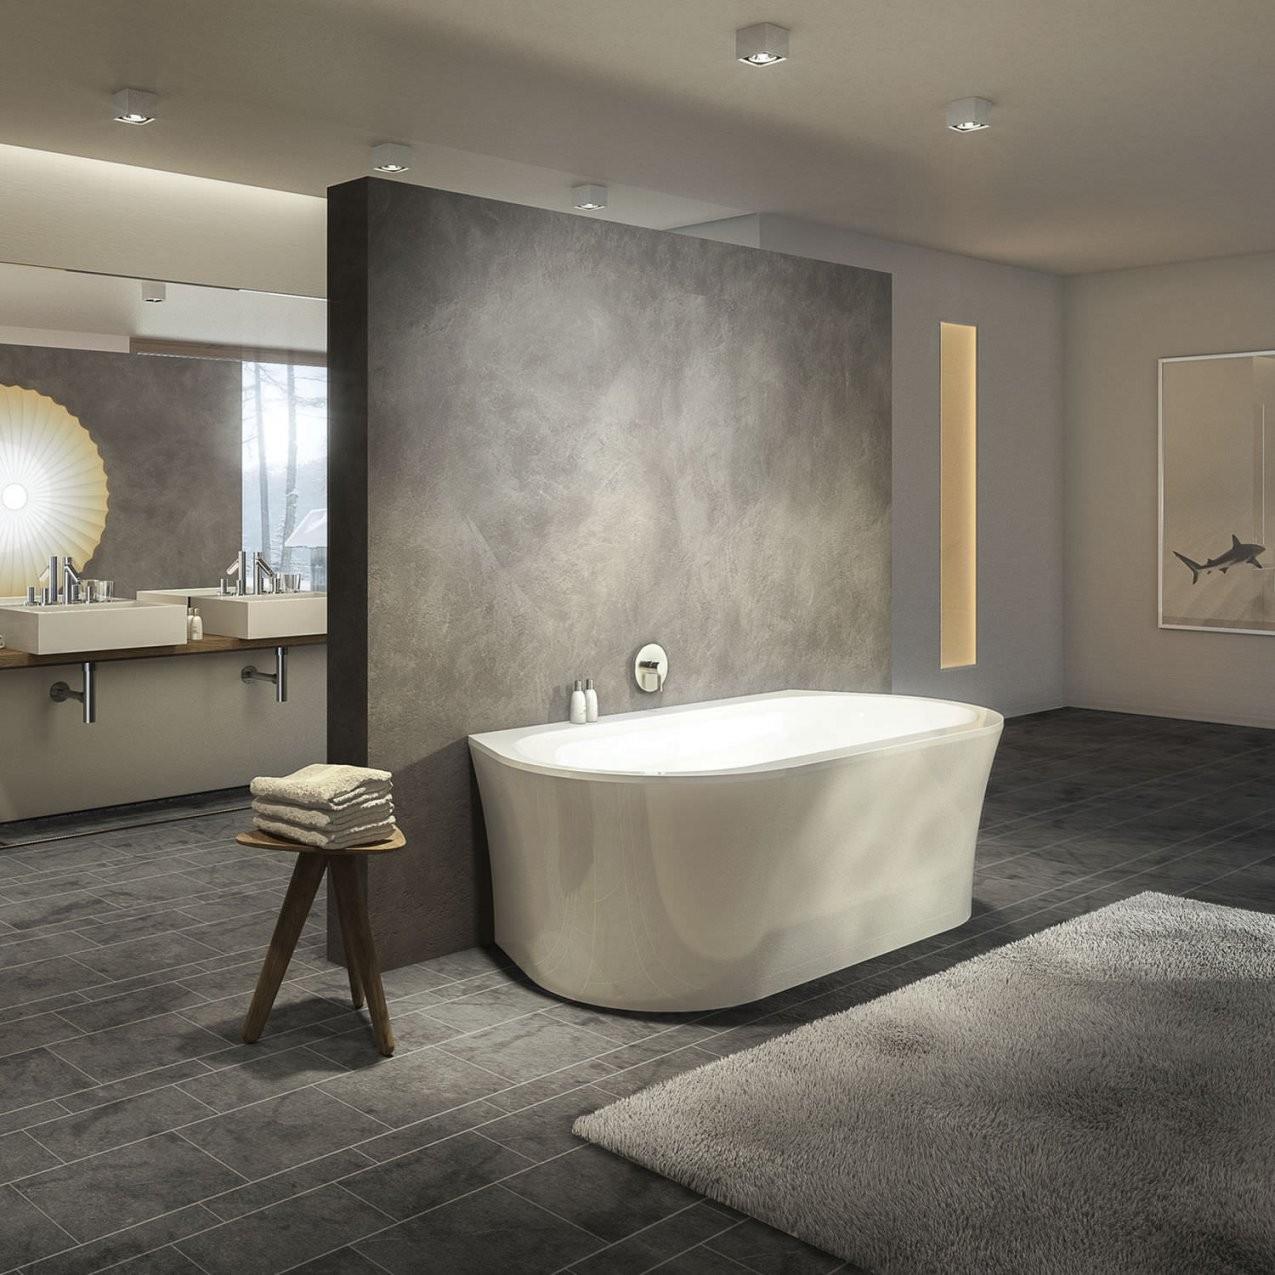 Freistehende Badewanne  Oval  Aus Acryl  Primeline Wall von Moderne Freistehende Badewannen Photo